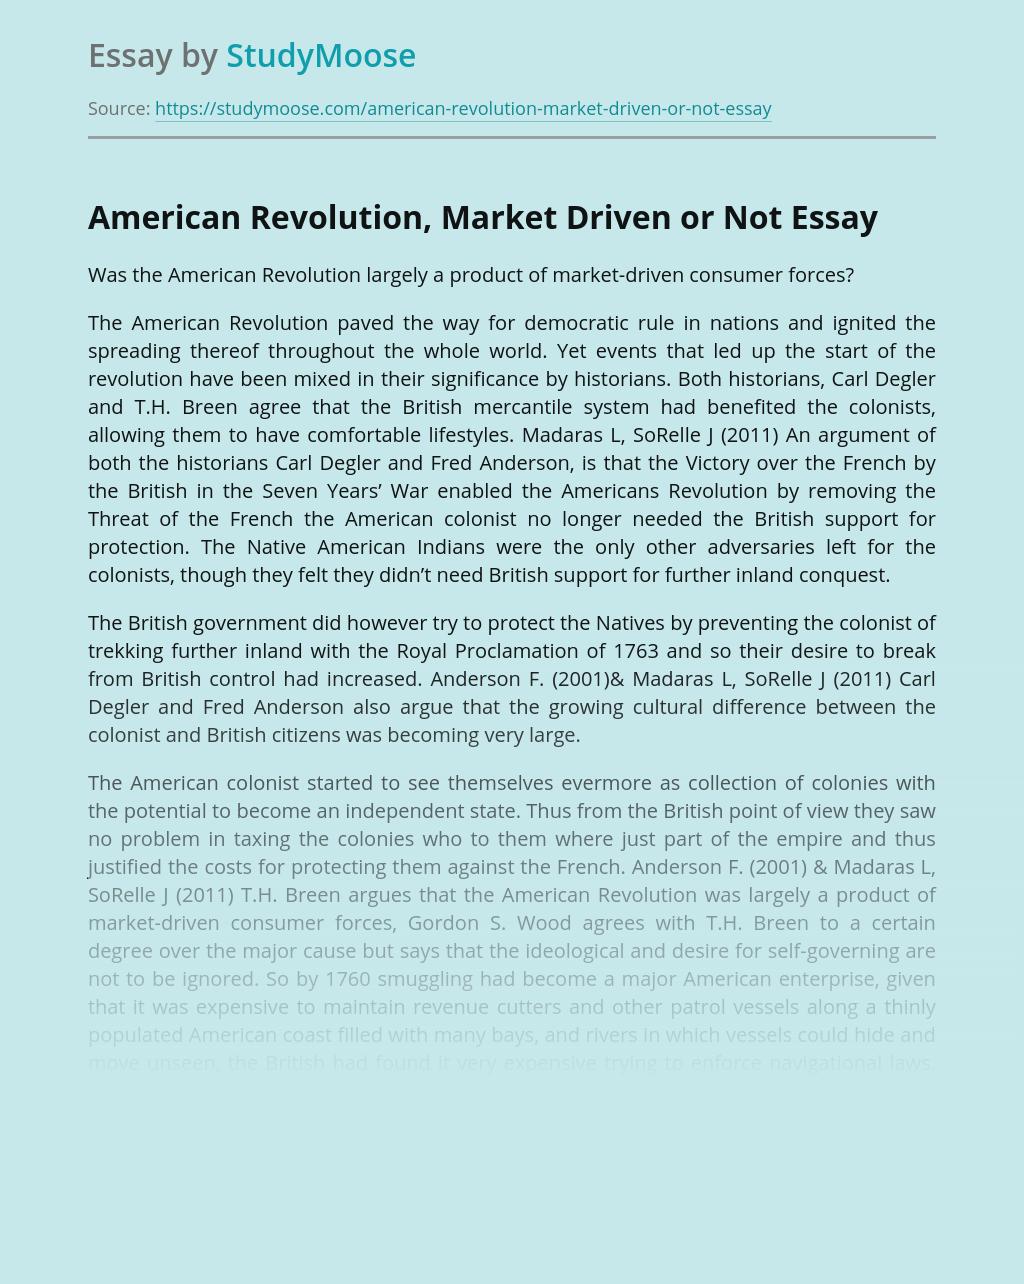 American Revolution, Market Driven or Not